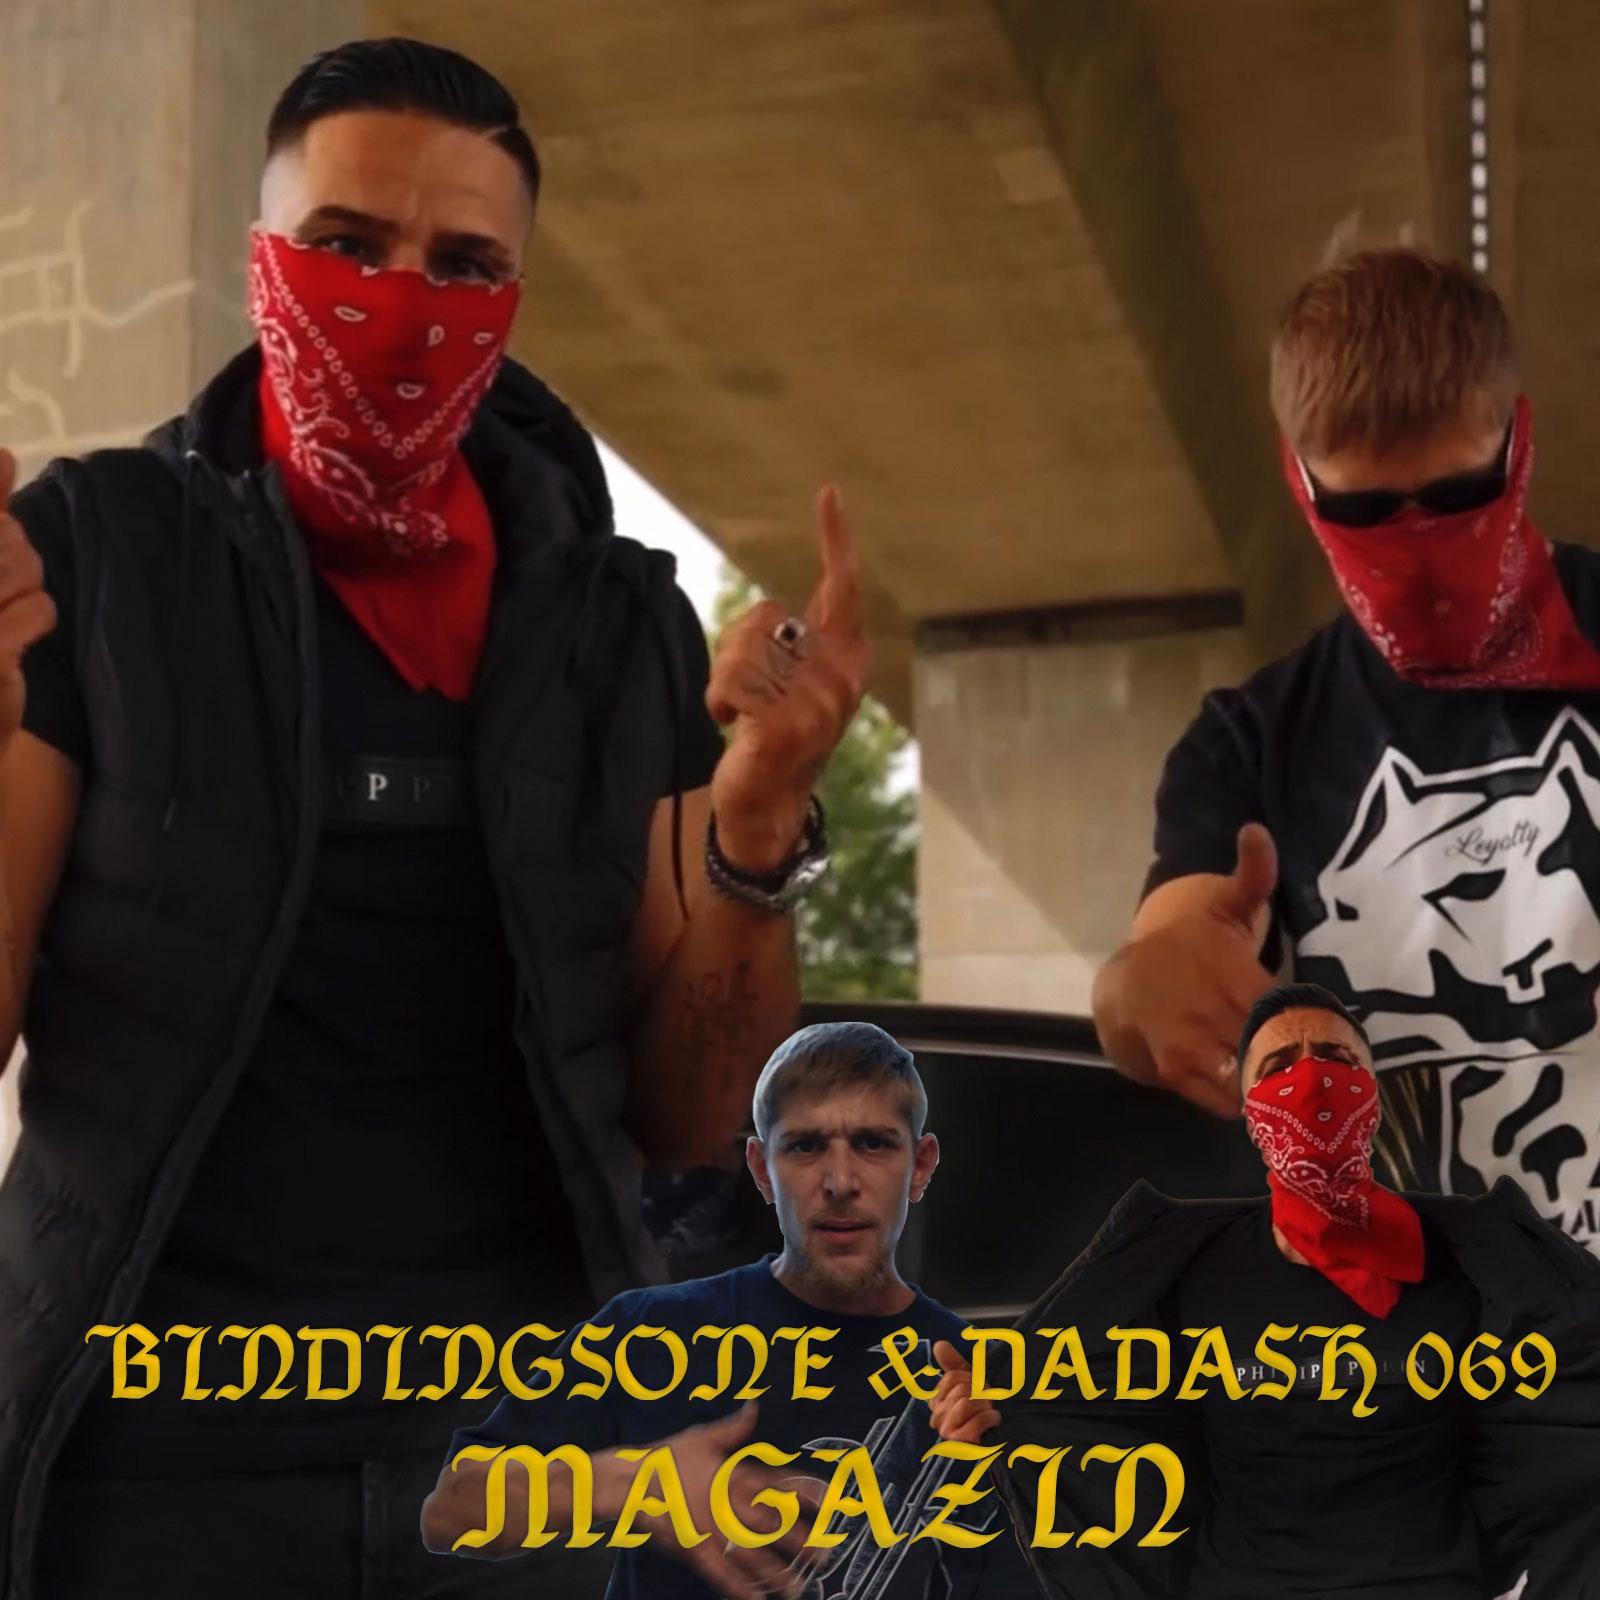 Upcoming: BindingsOne, Dadash069 - Magazin